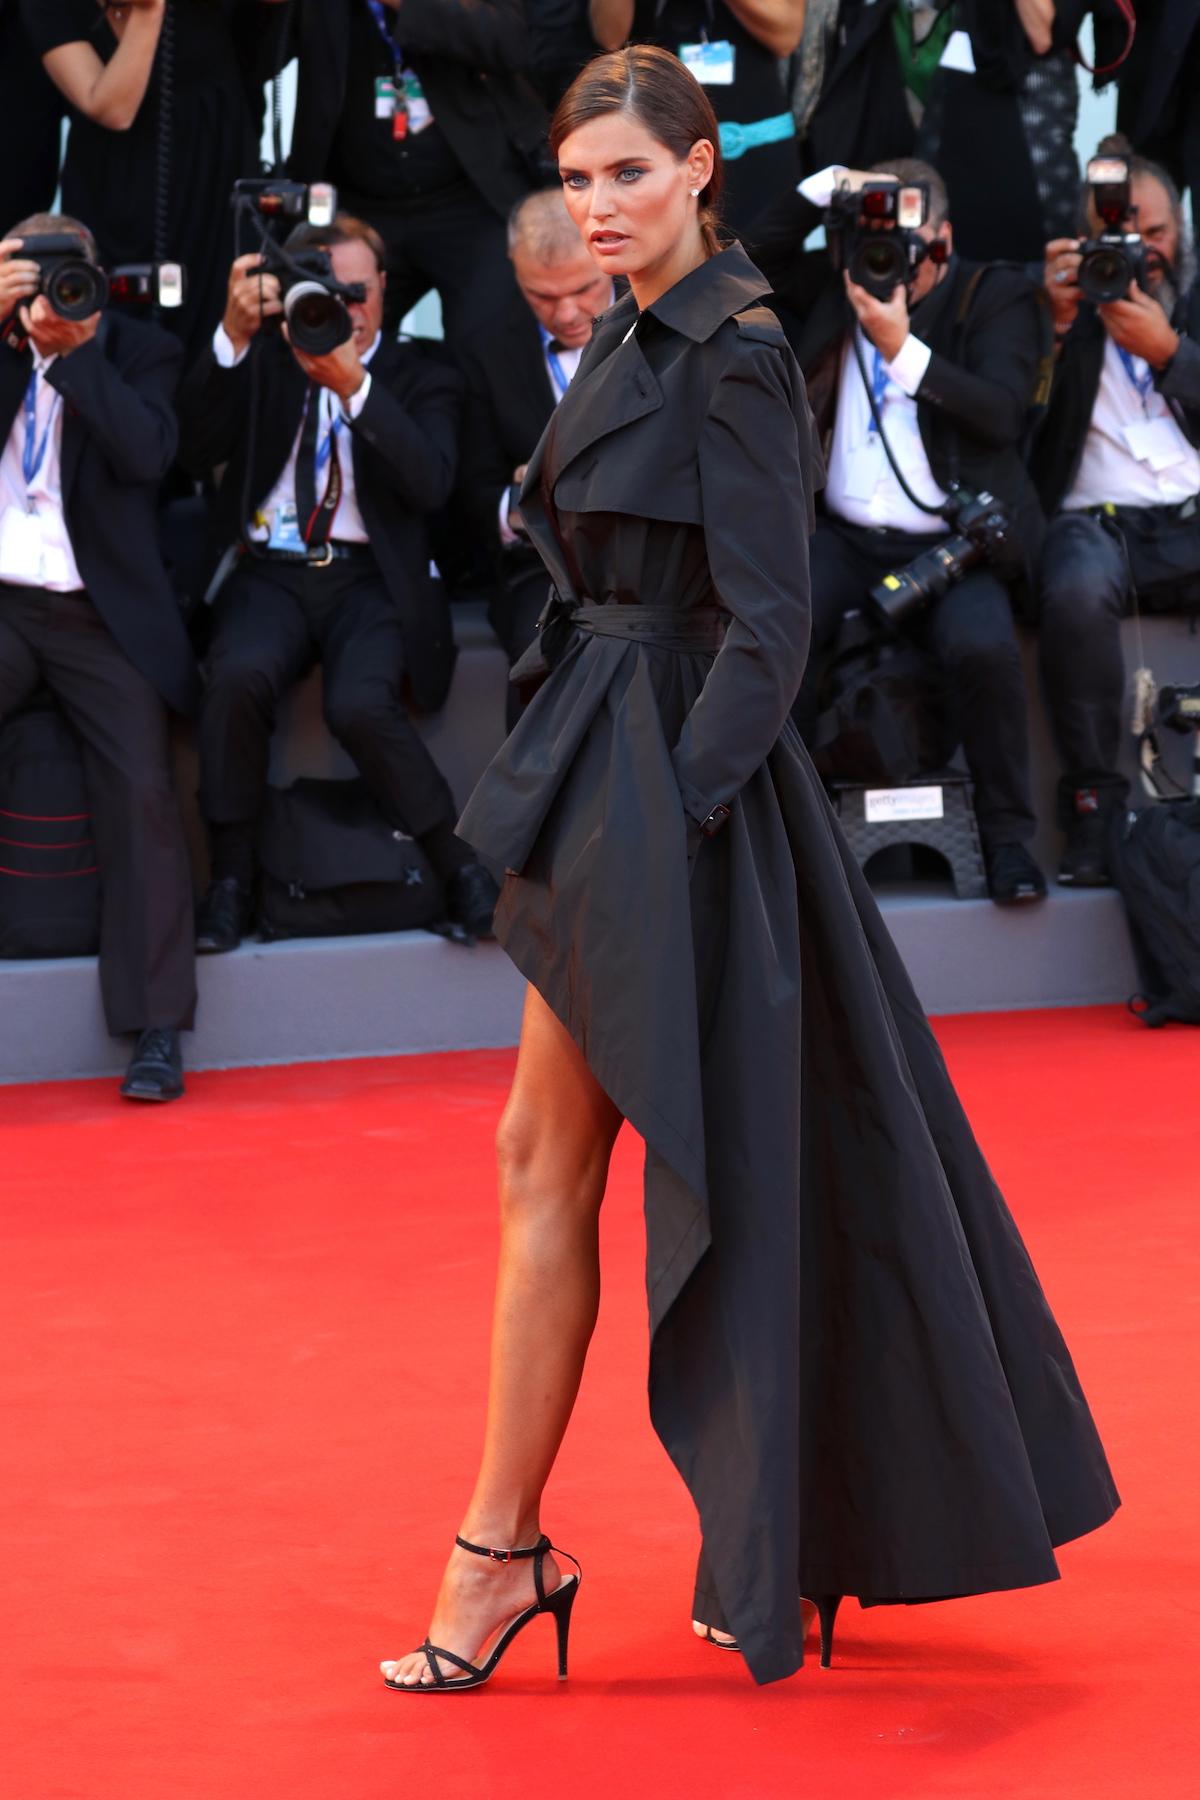 Venezia 2016: Bianca Balti posa sul red carpet